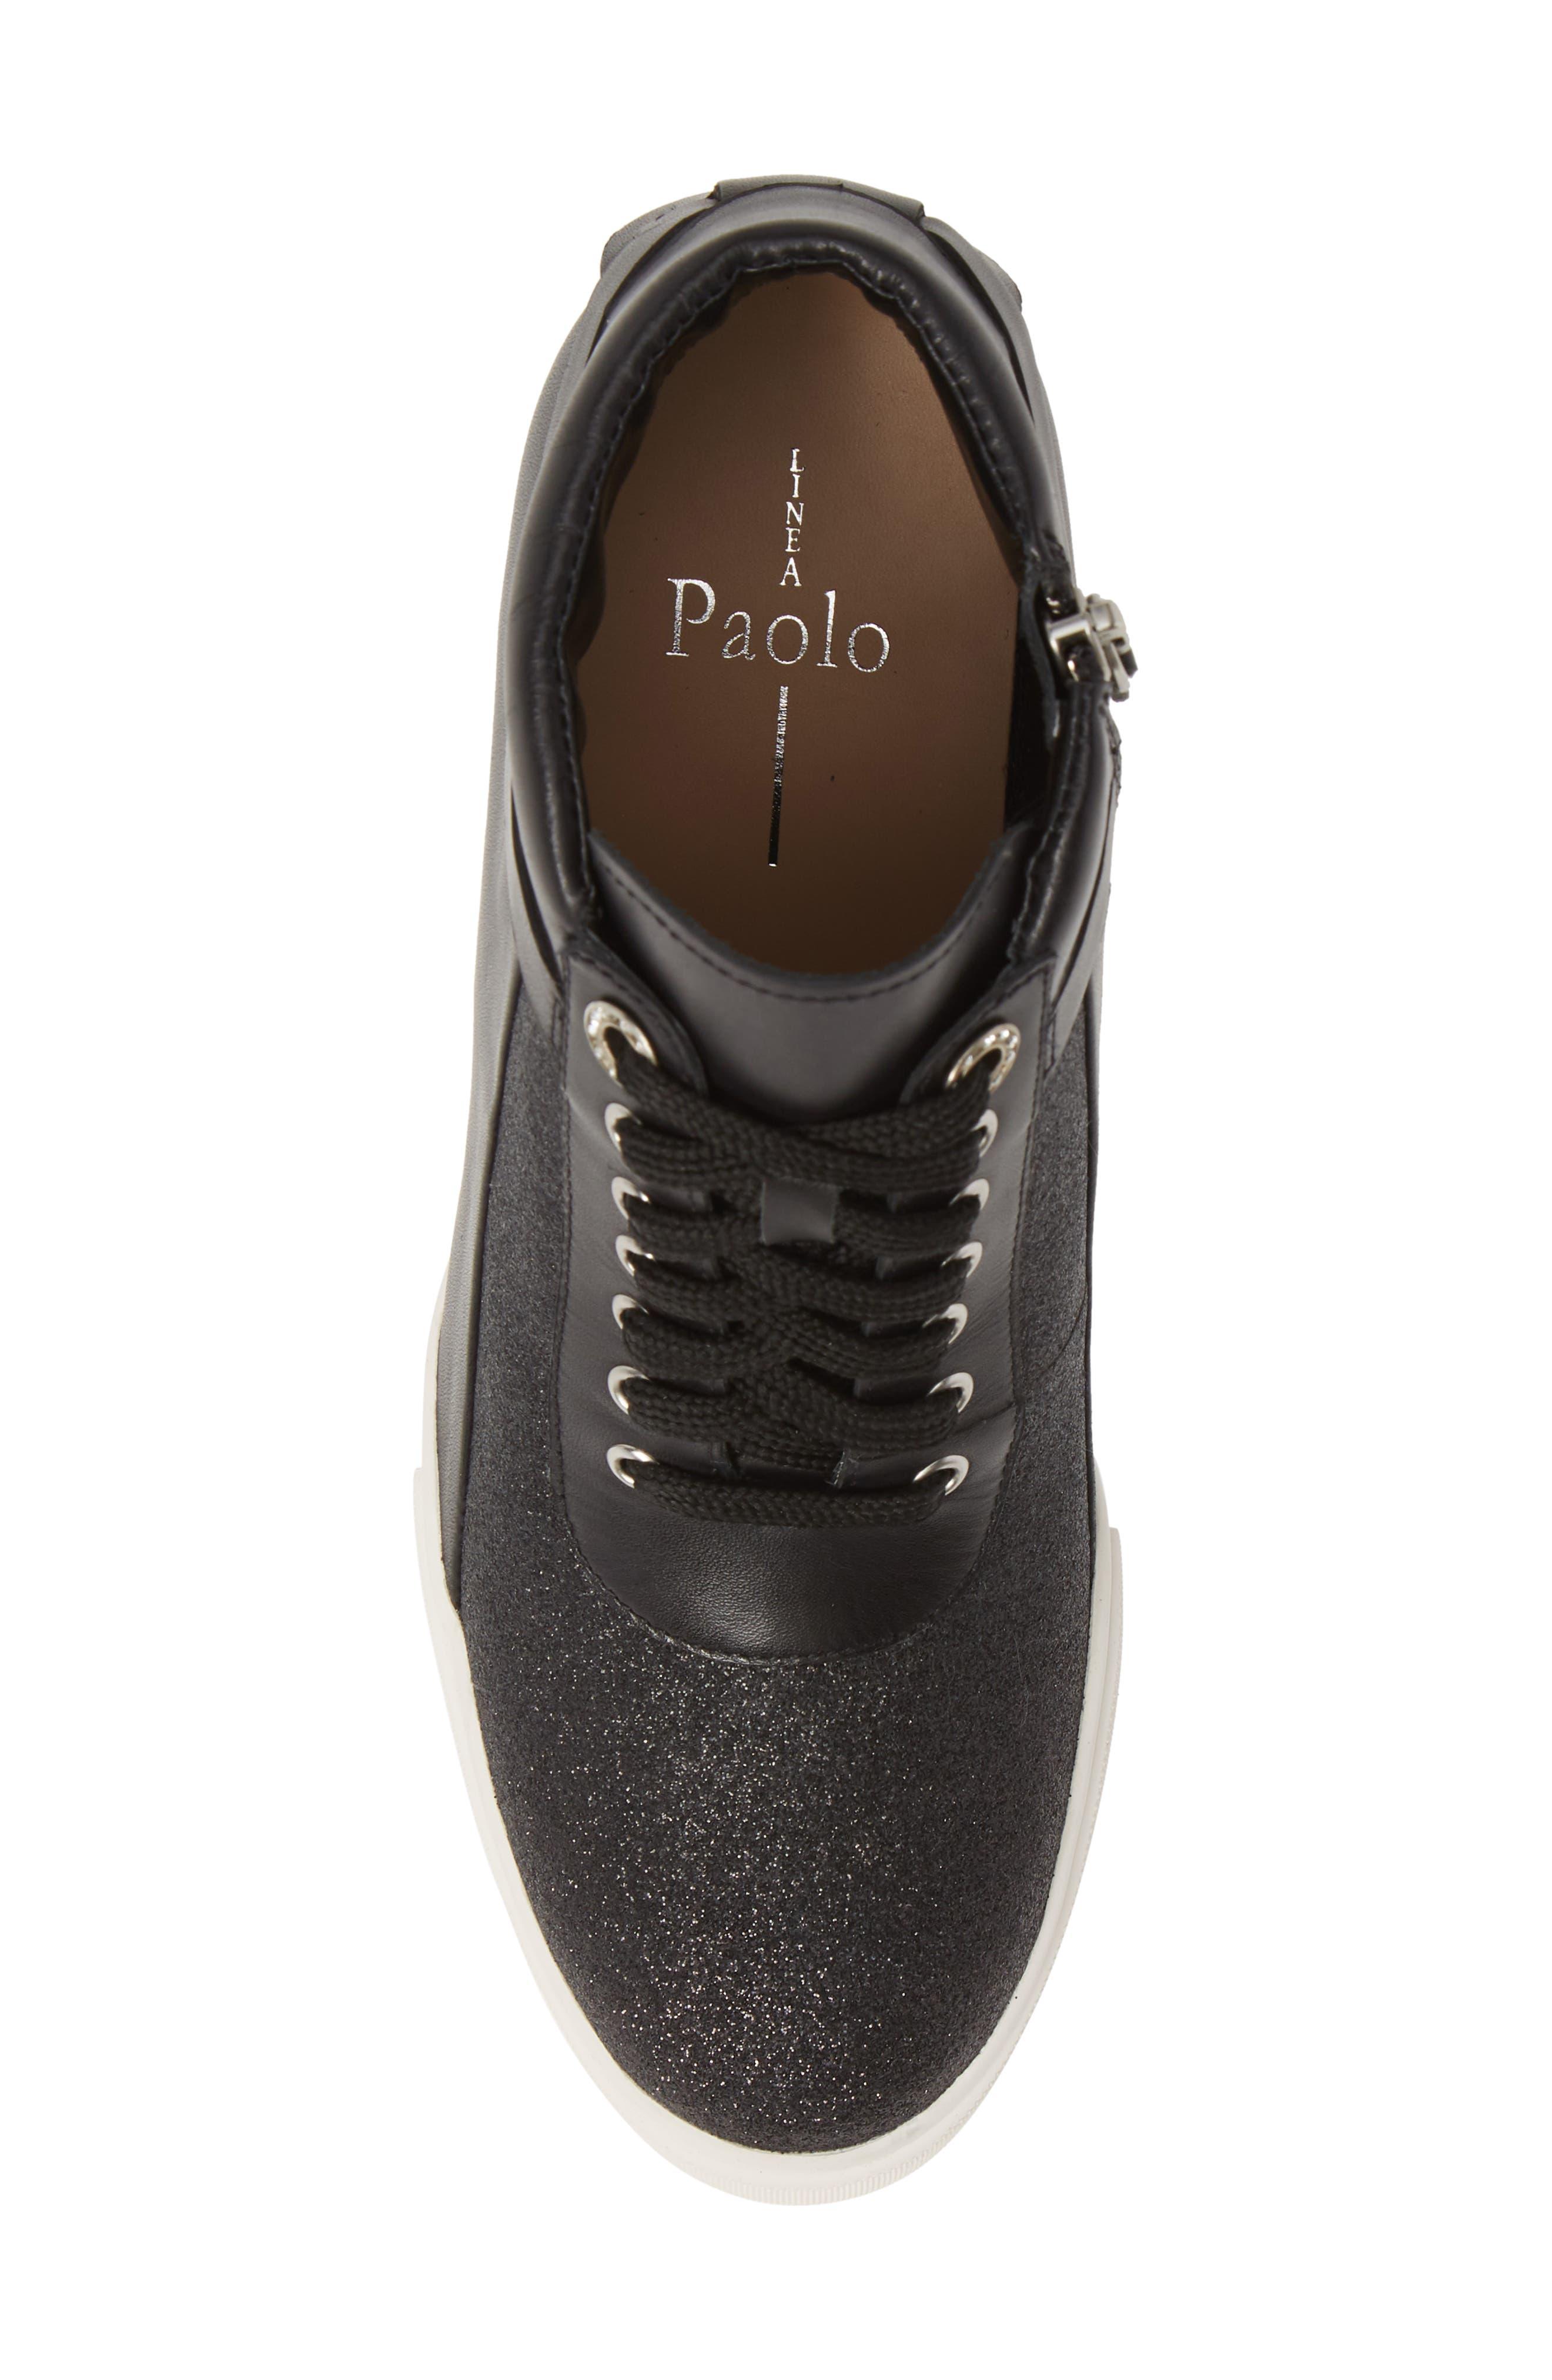 LINEA PAOLO, Freja Wedge Sneaker, Alternate thumbnail 5, color, BLACK GLISTEN LEATHER